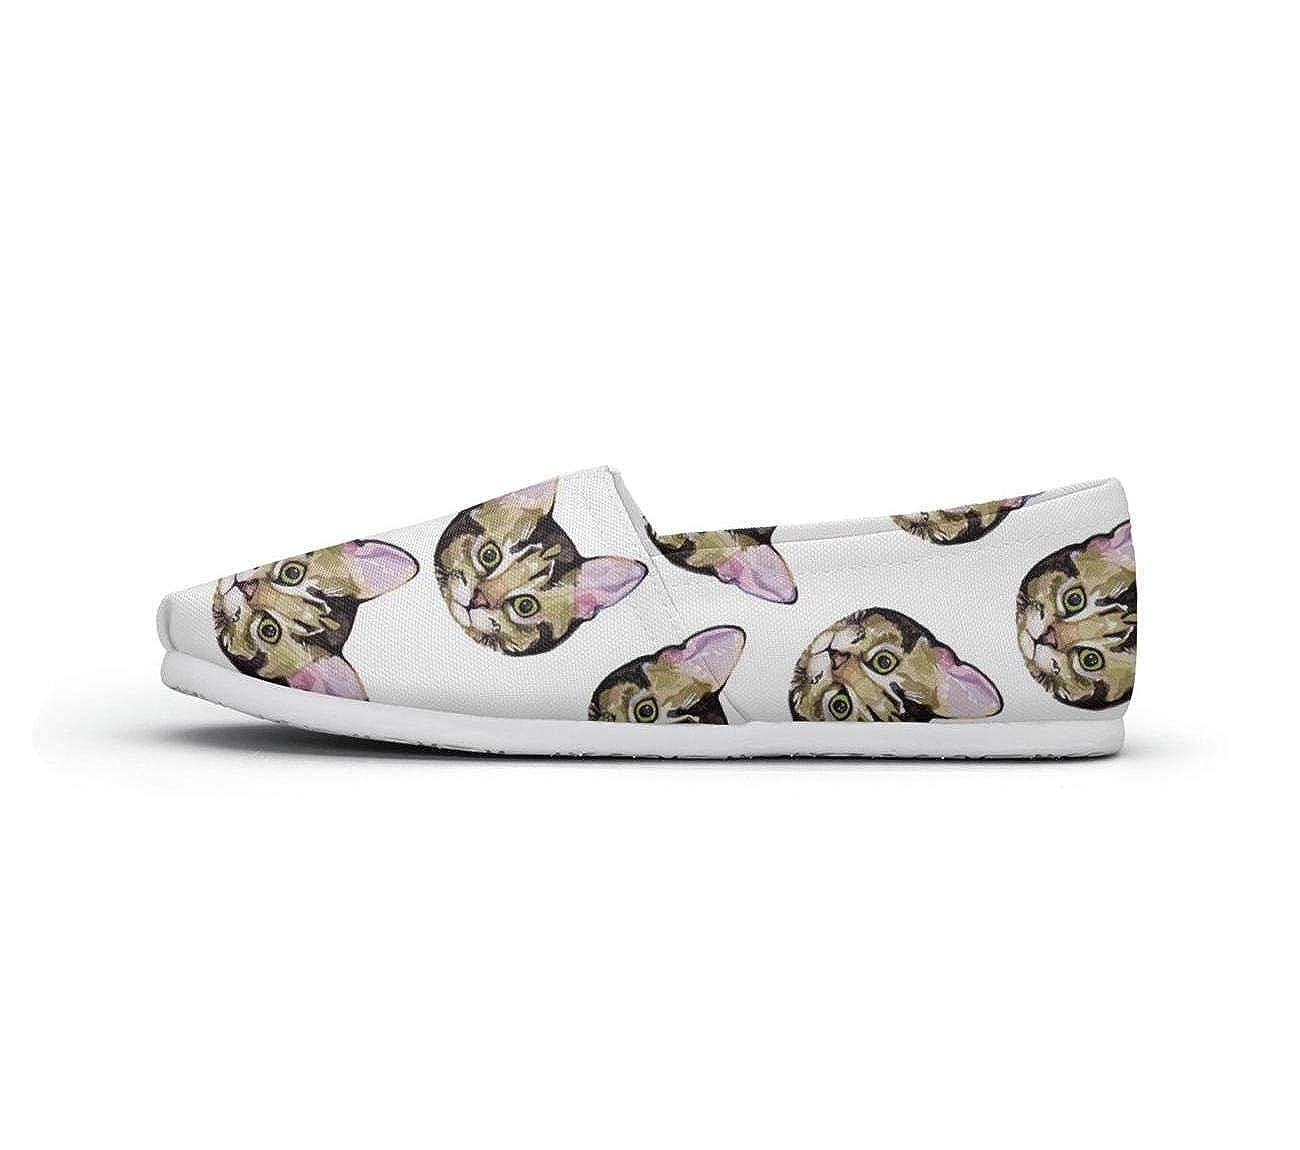 Moody Cat Natural Classics Womens Extra Light Flat Boat Shoes Girls Espadrille Flats